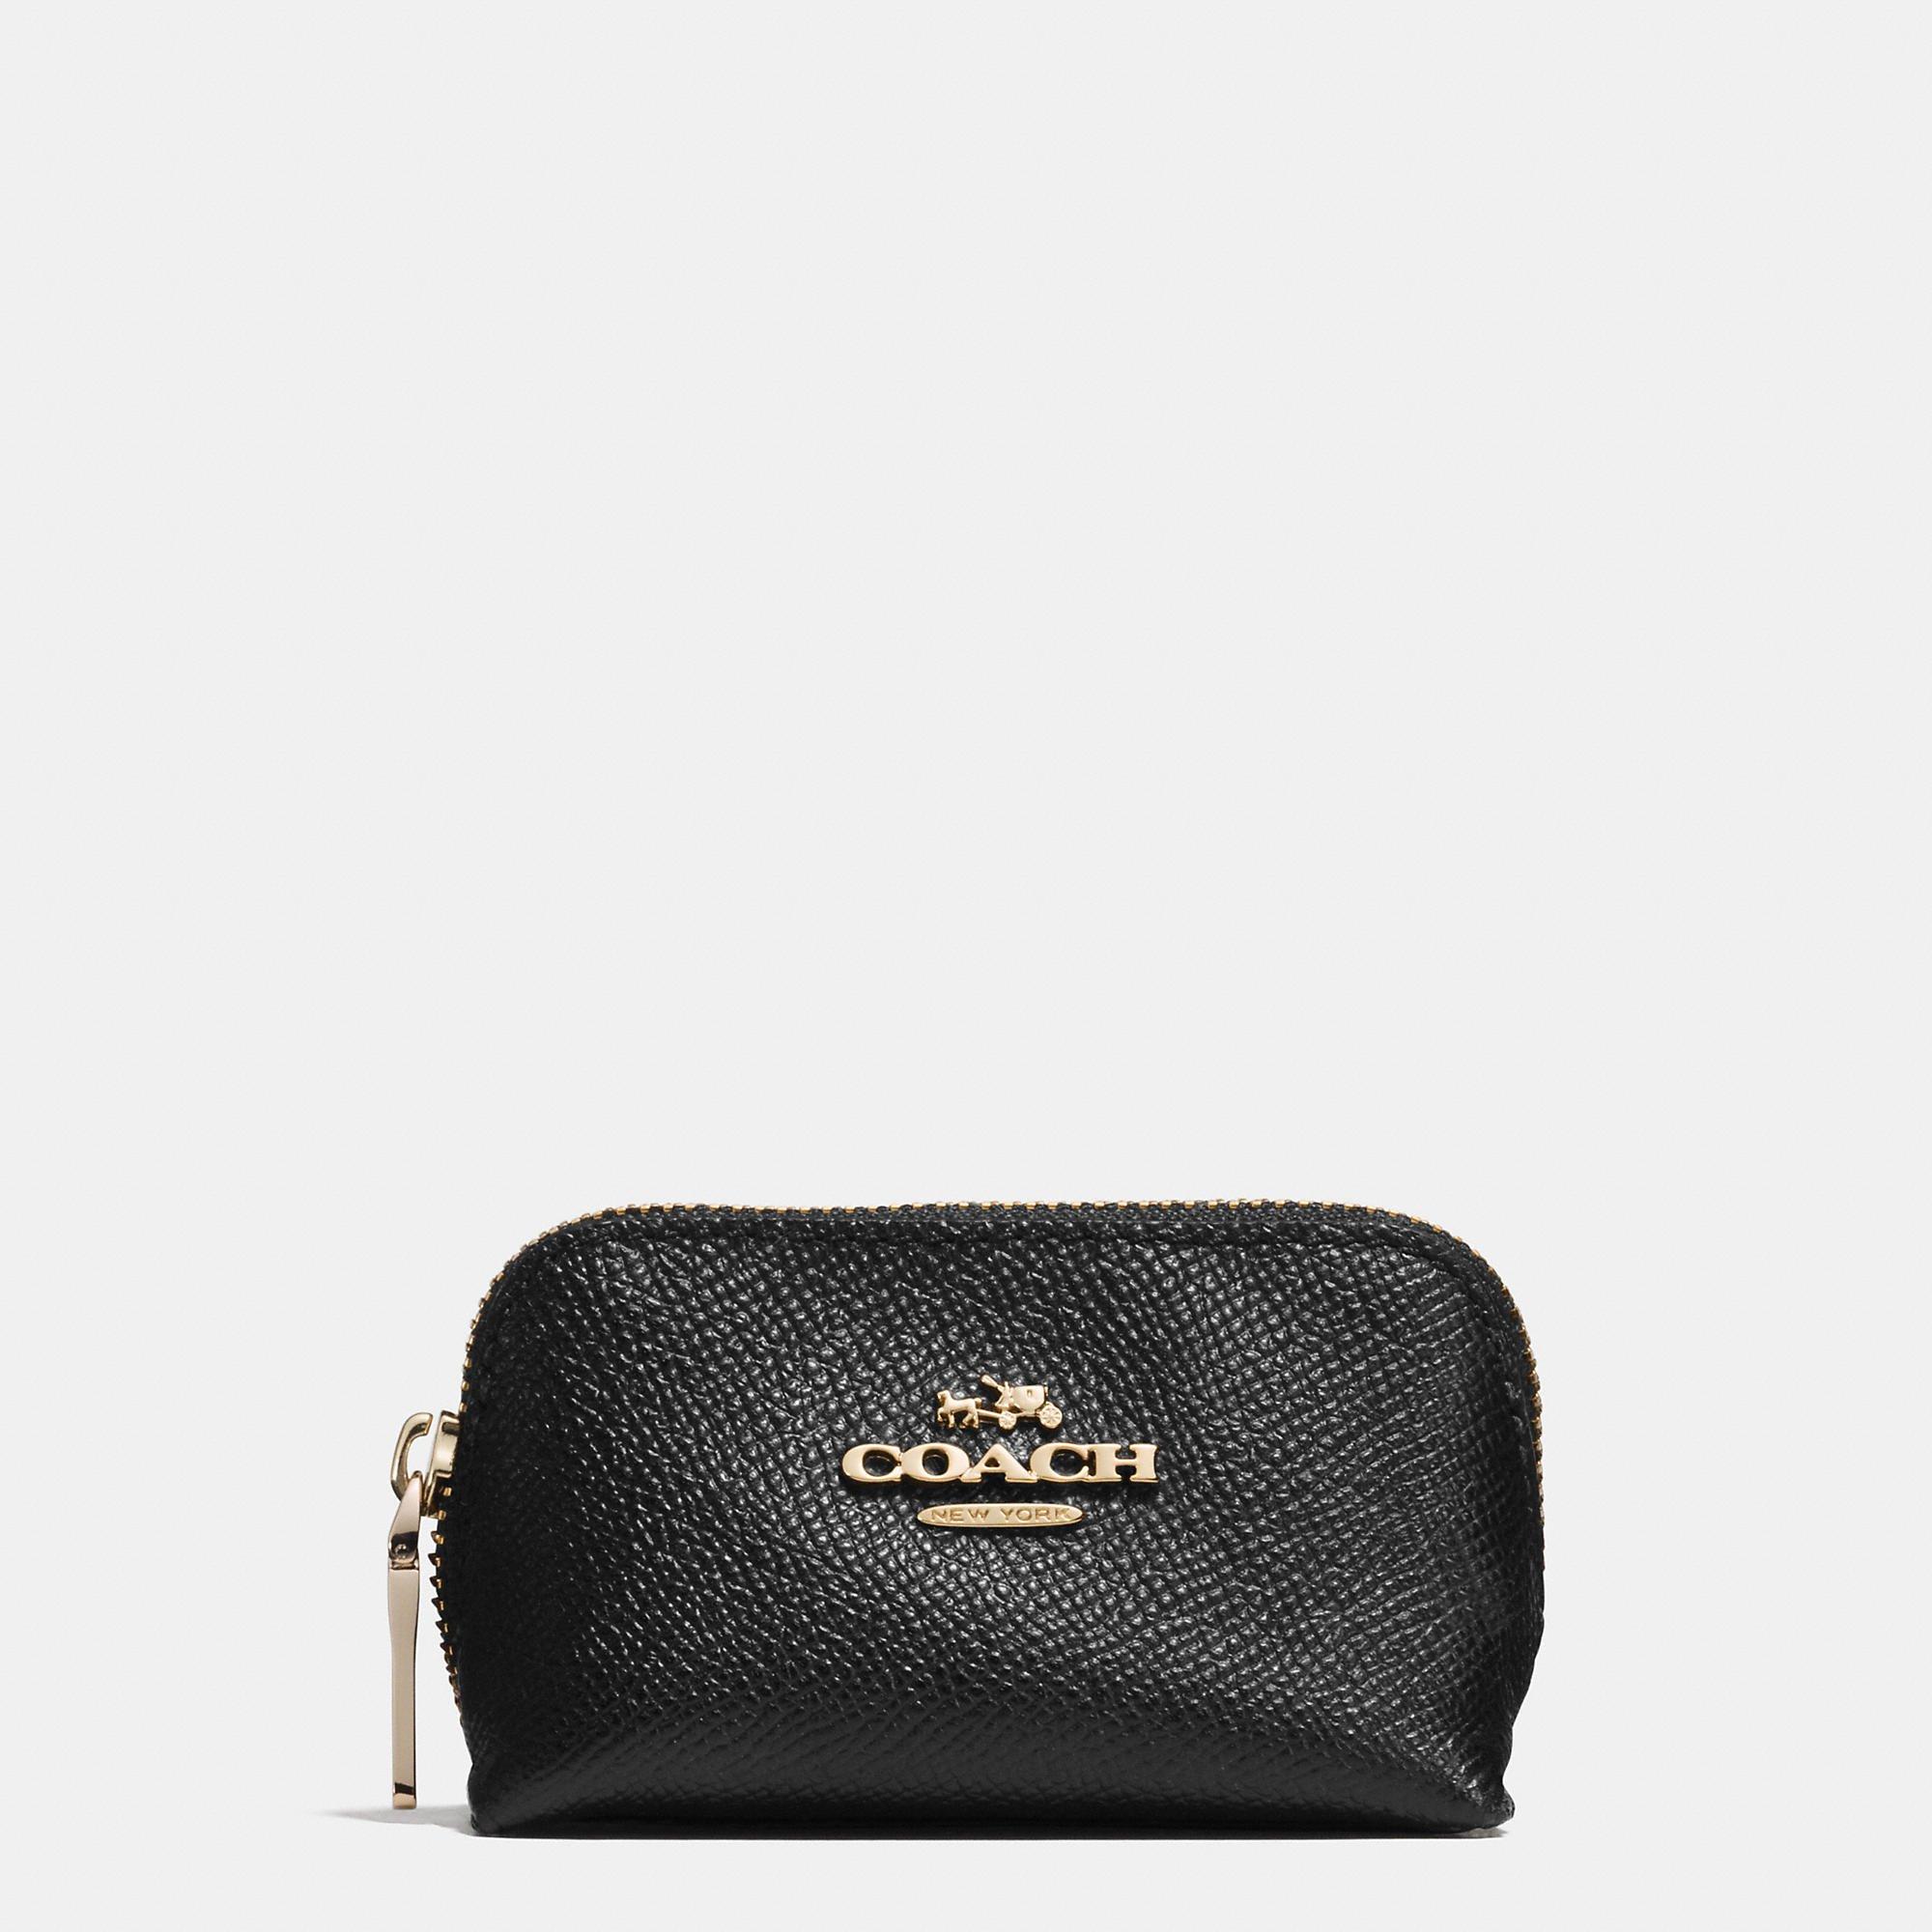 89ceb57d8fdaf ... spain coach crossgrain leather mini ruby crossbody bag black f34604  coach crossgrain mini bennett satchel crossbody sale ...